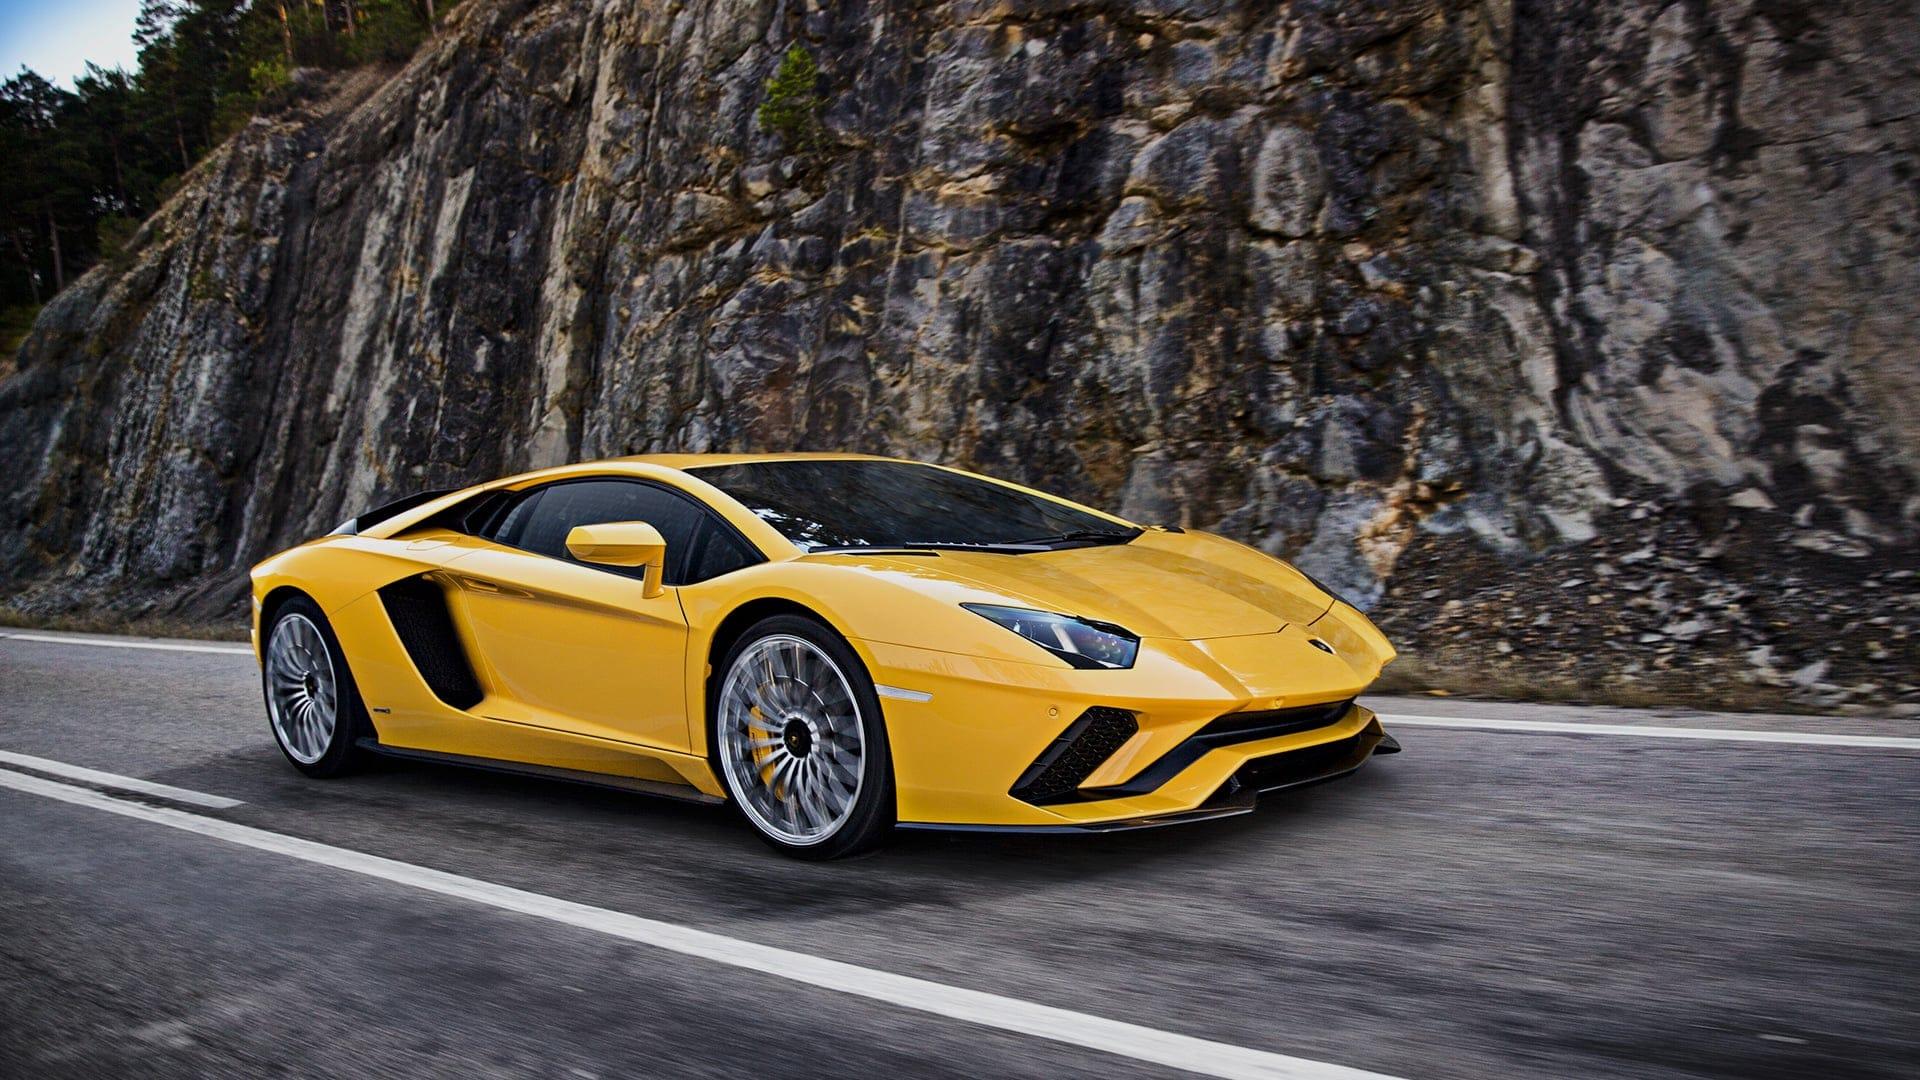 luxury rent rental porsche rome carbrand exotic car boxster ferrari rentals hire italy